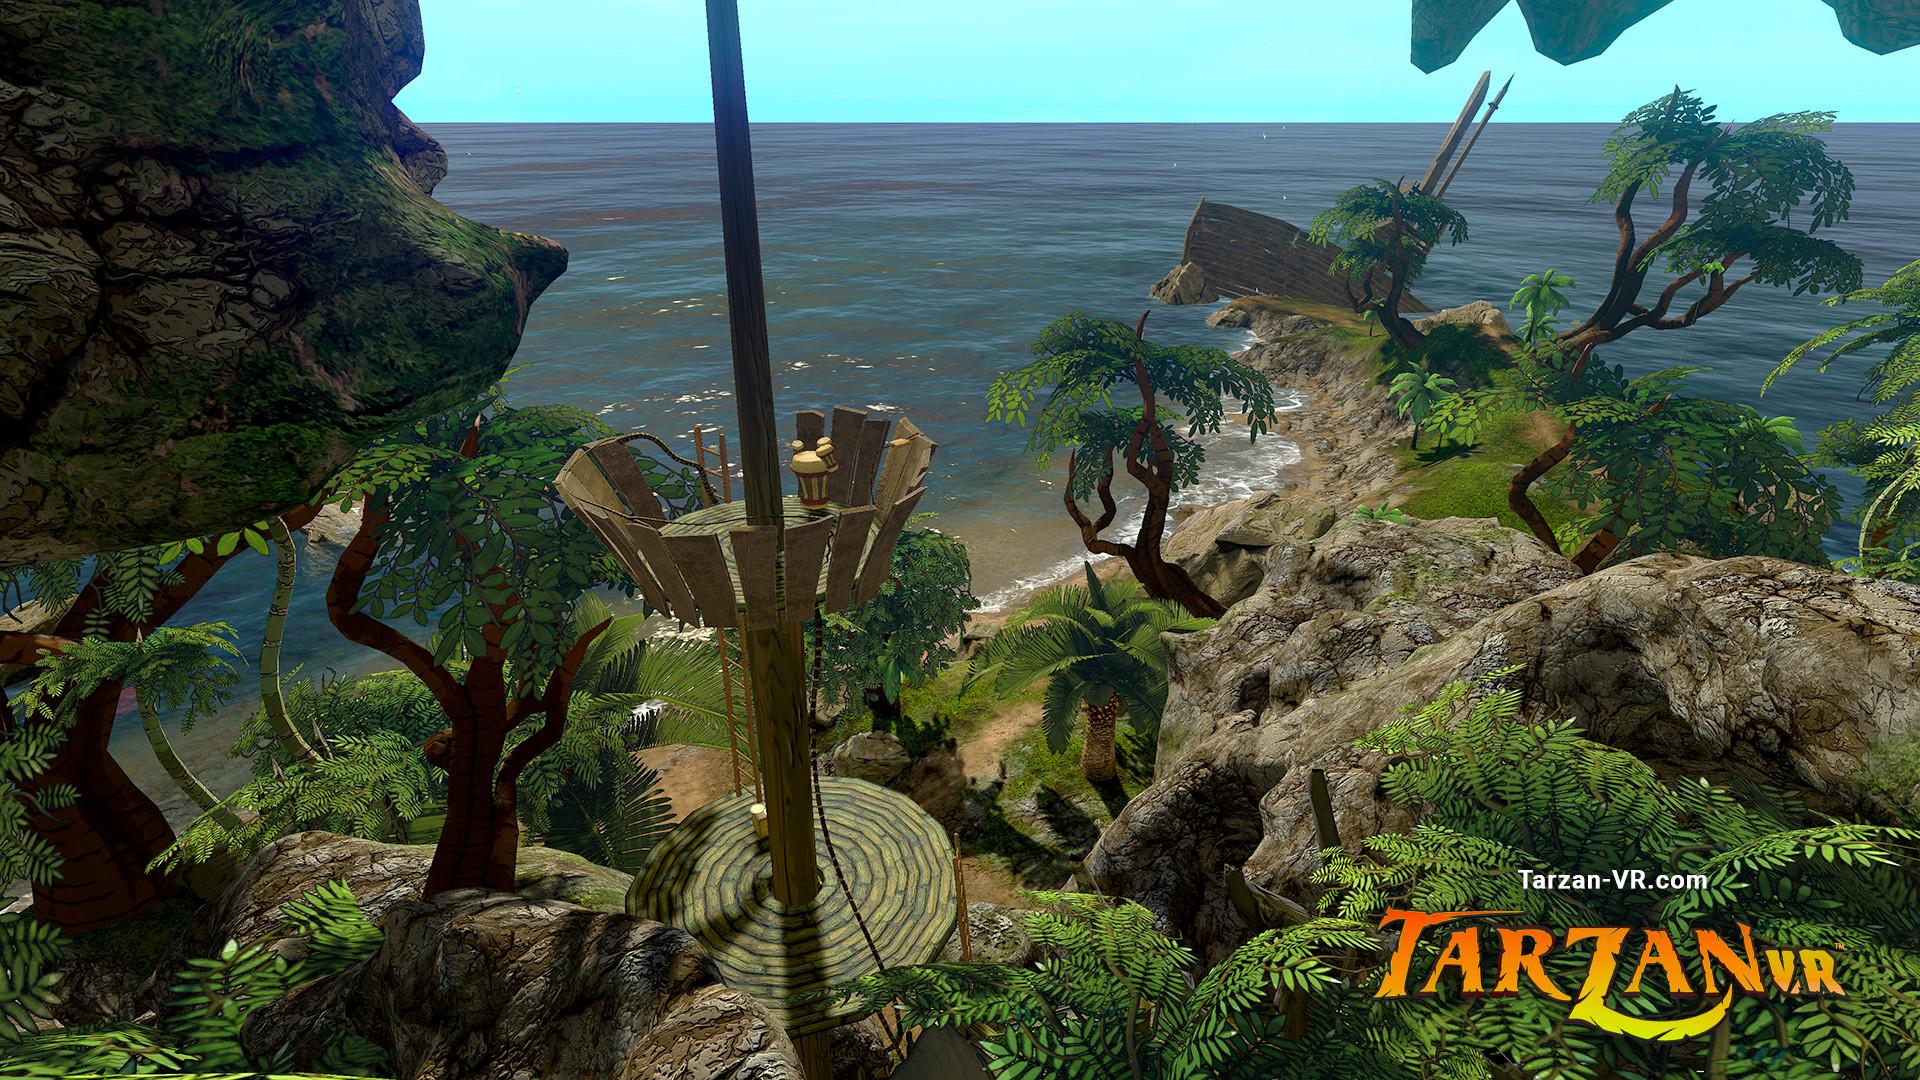 Tarzan VR  Issue #1 - THE GREAT APE screenshot